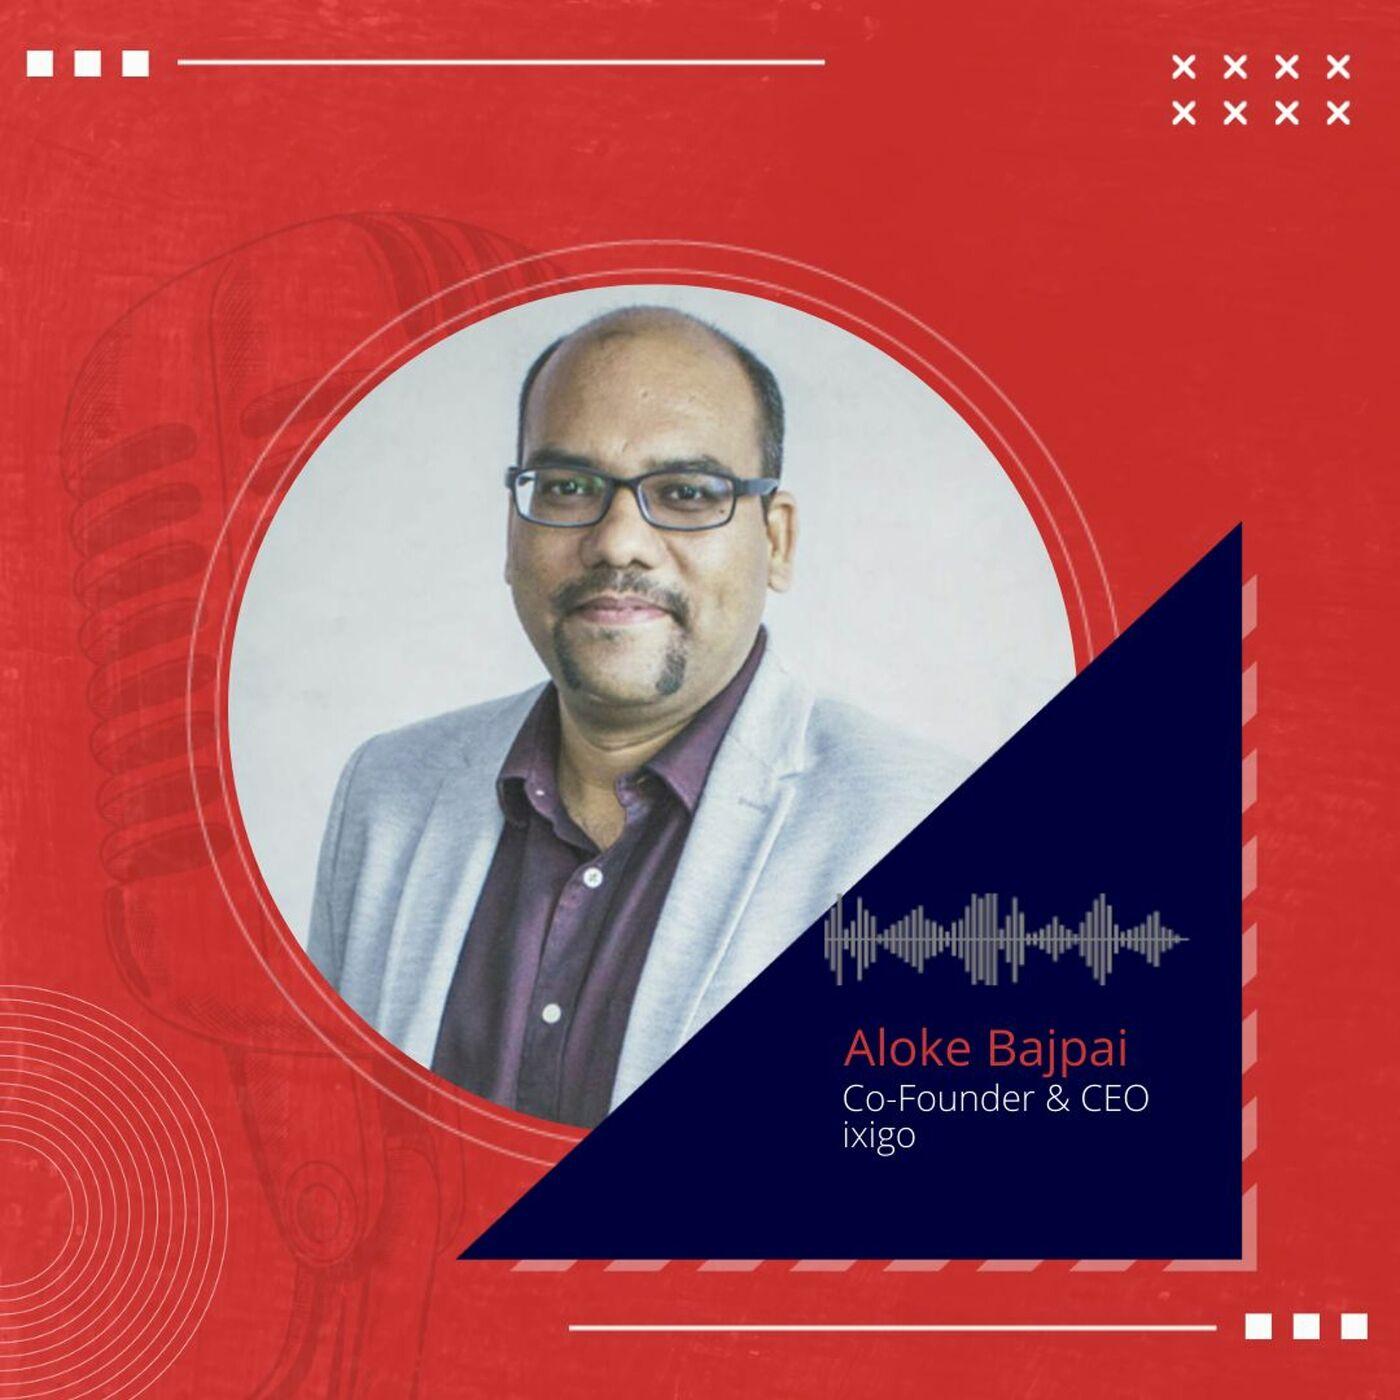 Inside the mind of Aloke Bajpai, Co-Founder & CEO, ixigo